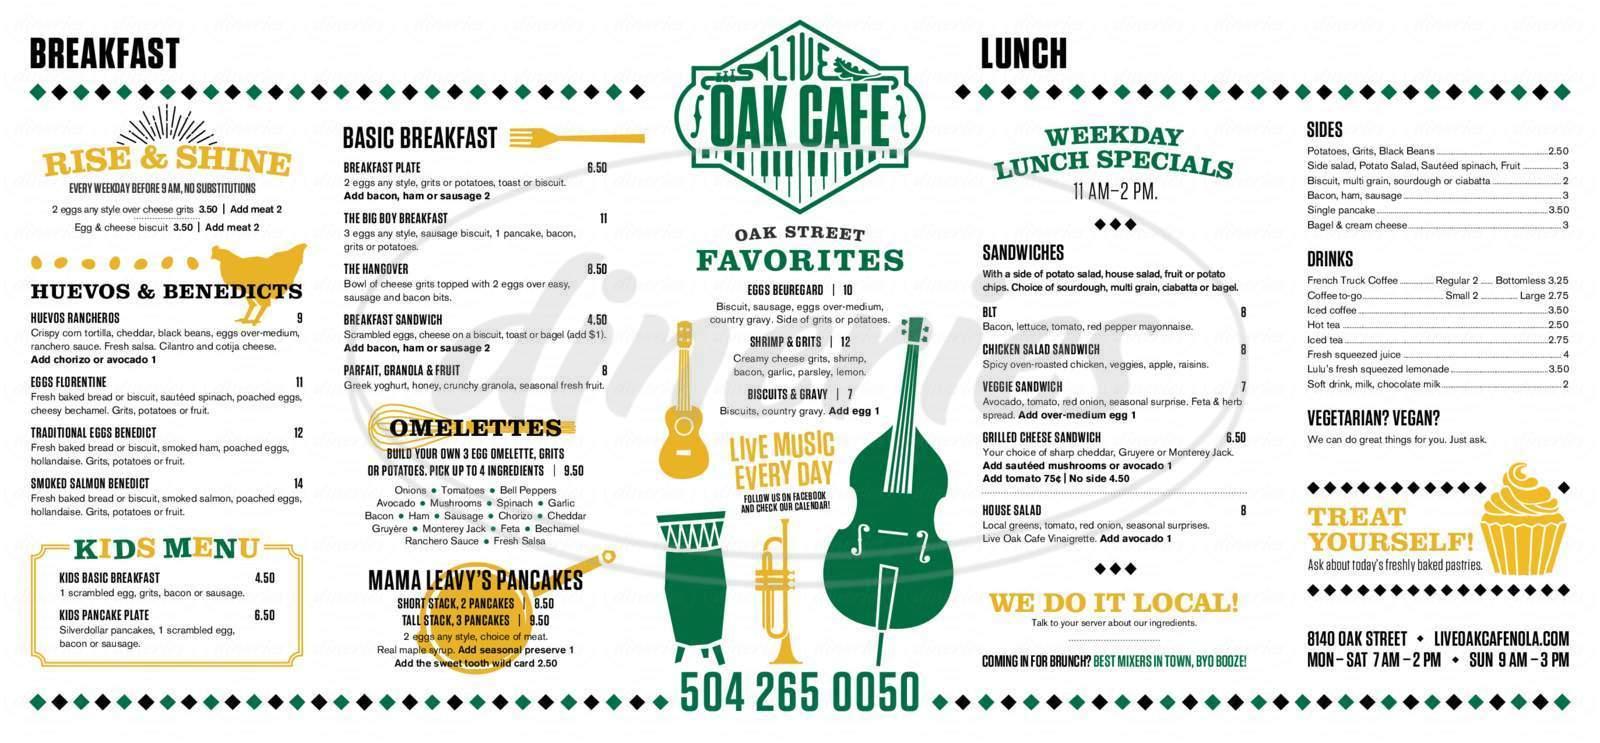 menu for Oak Street Cafe